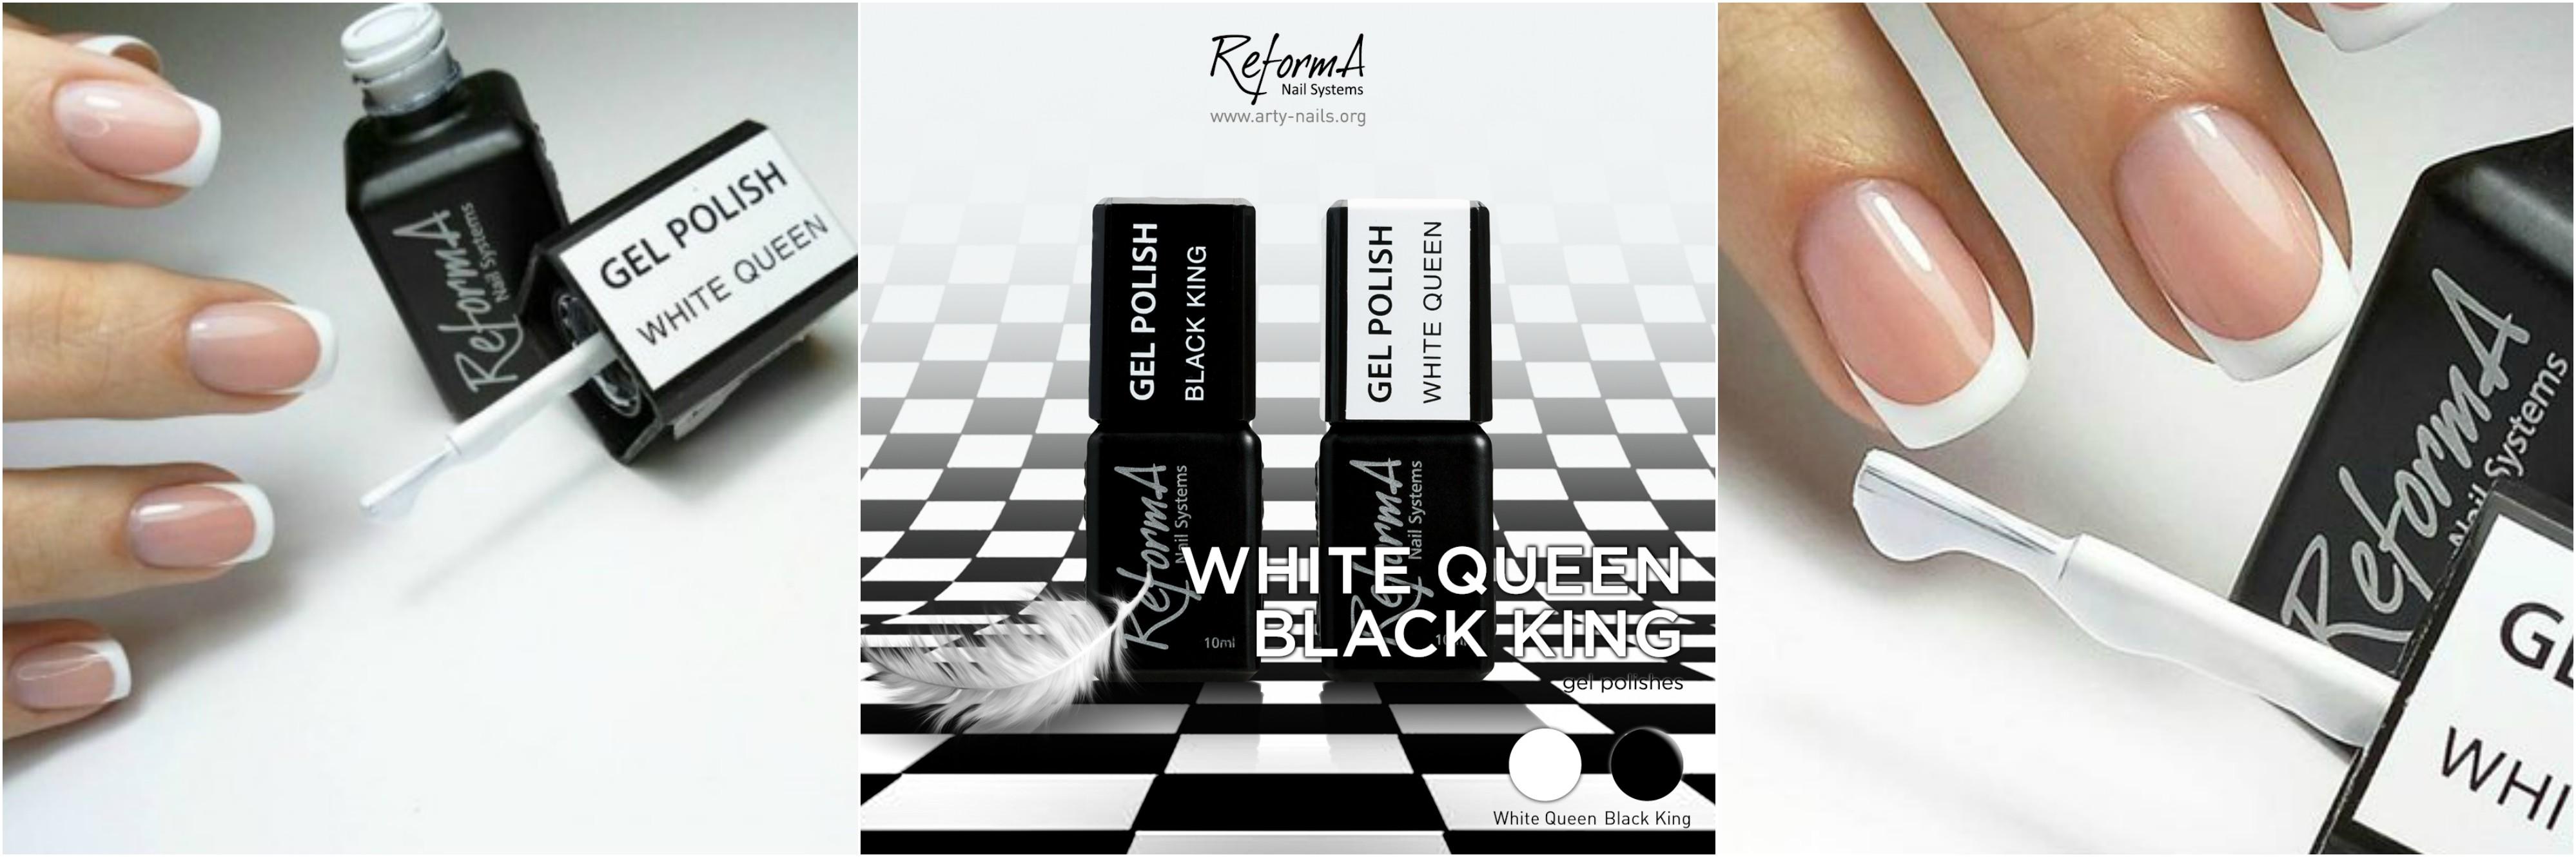 Reforma gel lak – White Queen in Black King